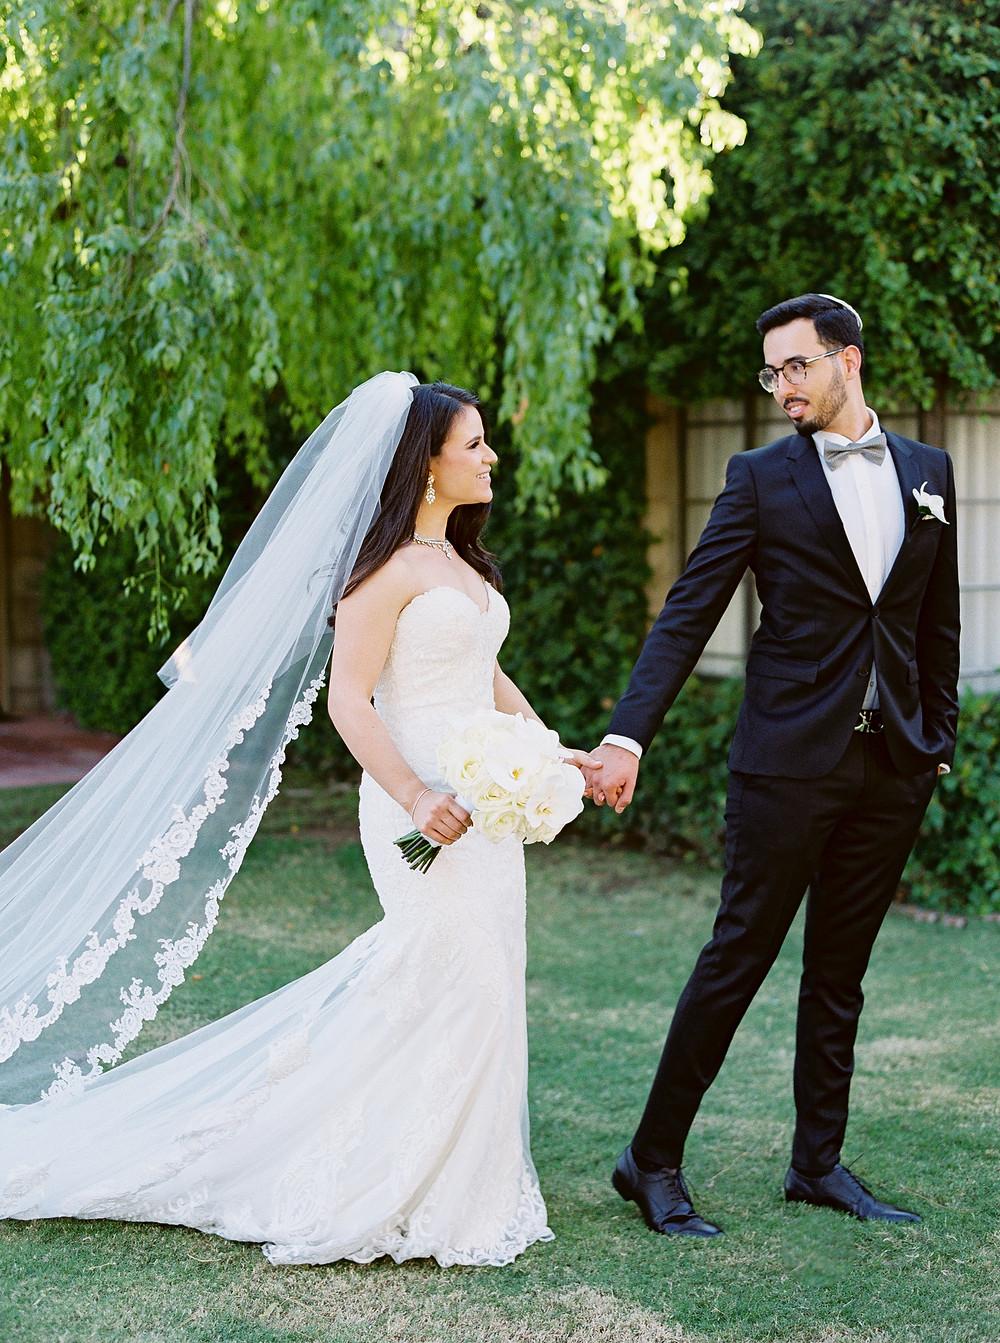 Arizona Biltmore Classic White Wedding, Bride & Groom